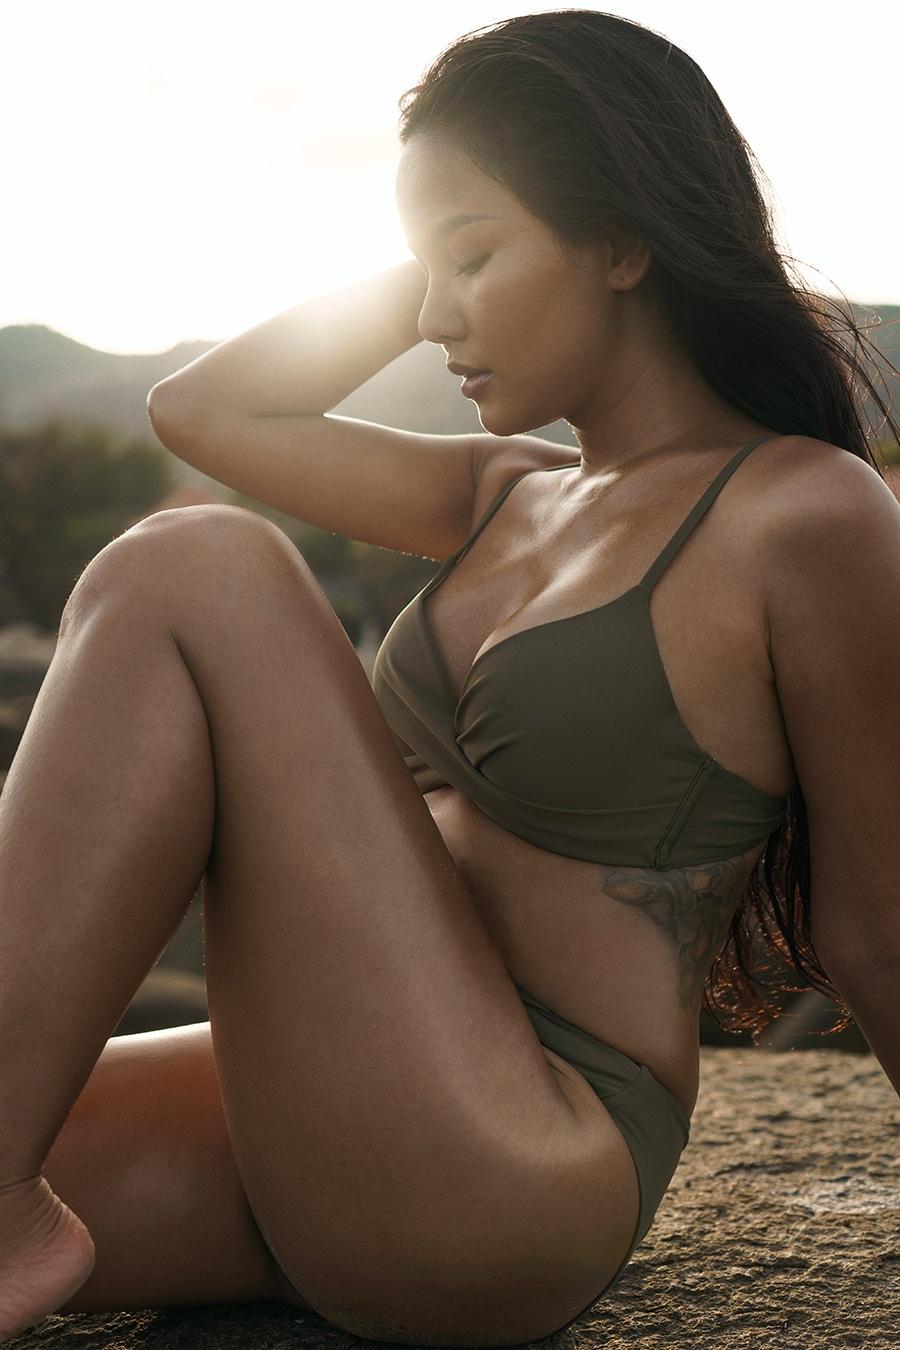 Girl at the beach in a bikini